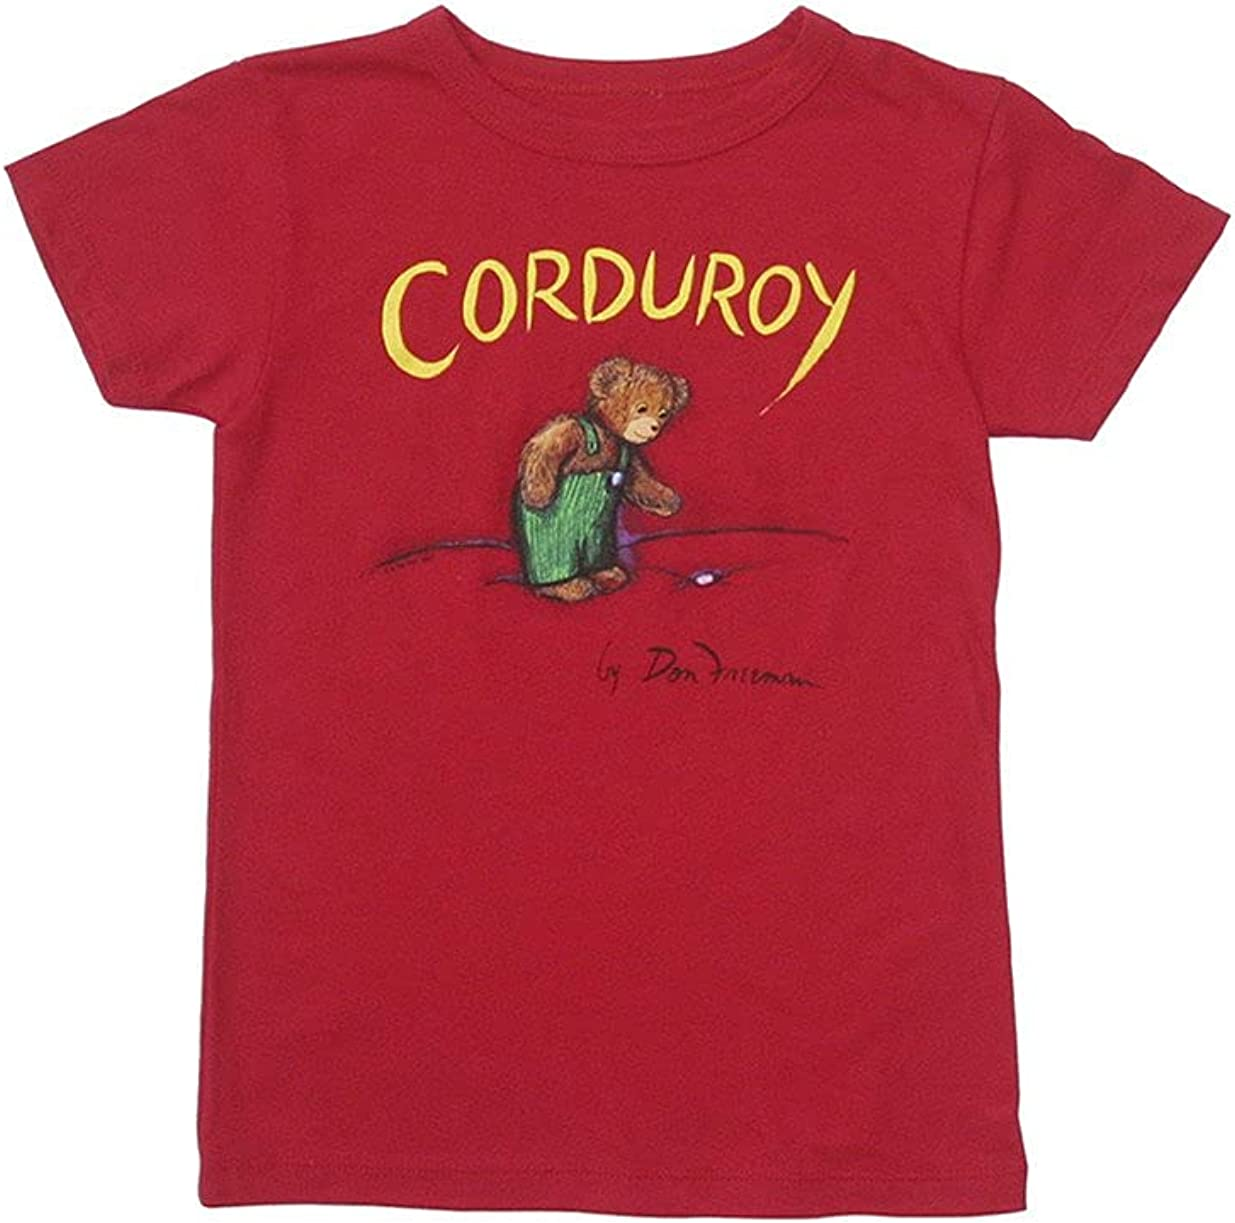 Out of Print Corduroy Kids Shirt 10 Yr